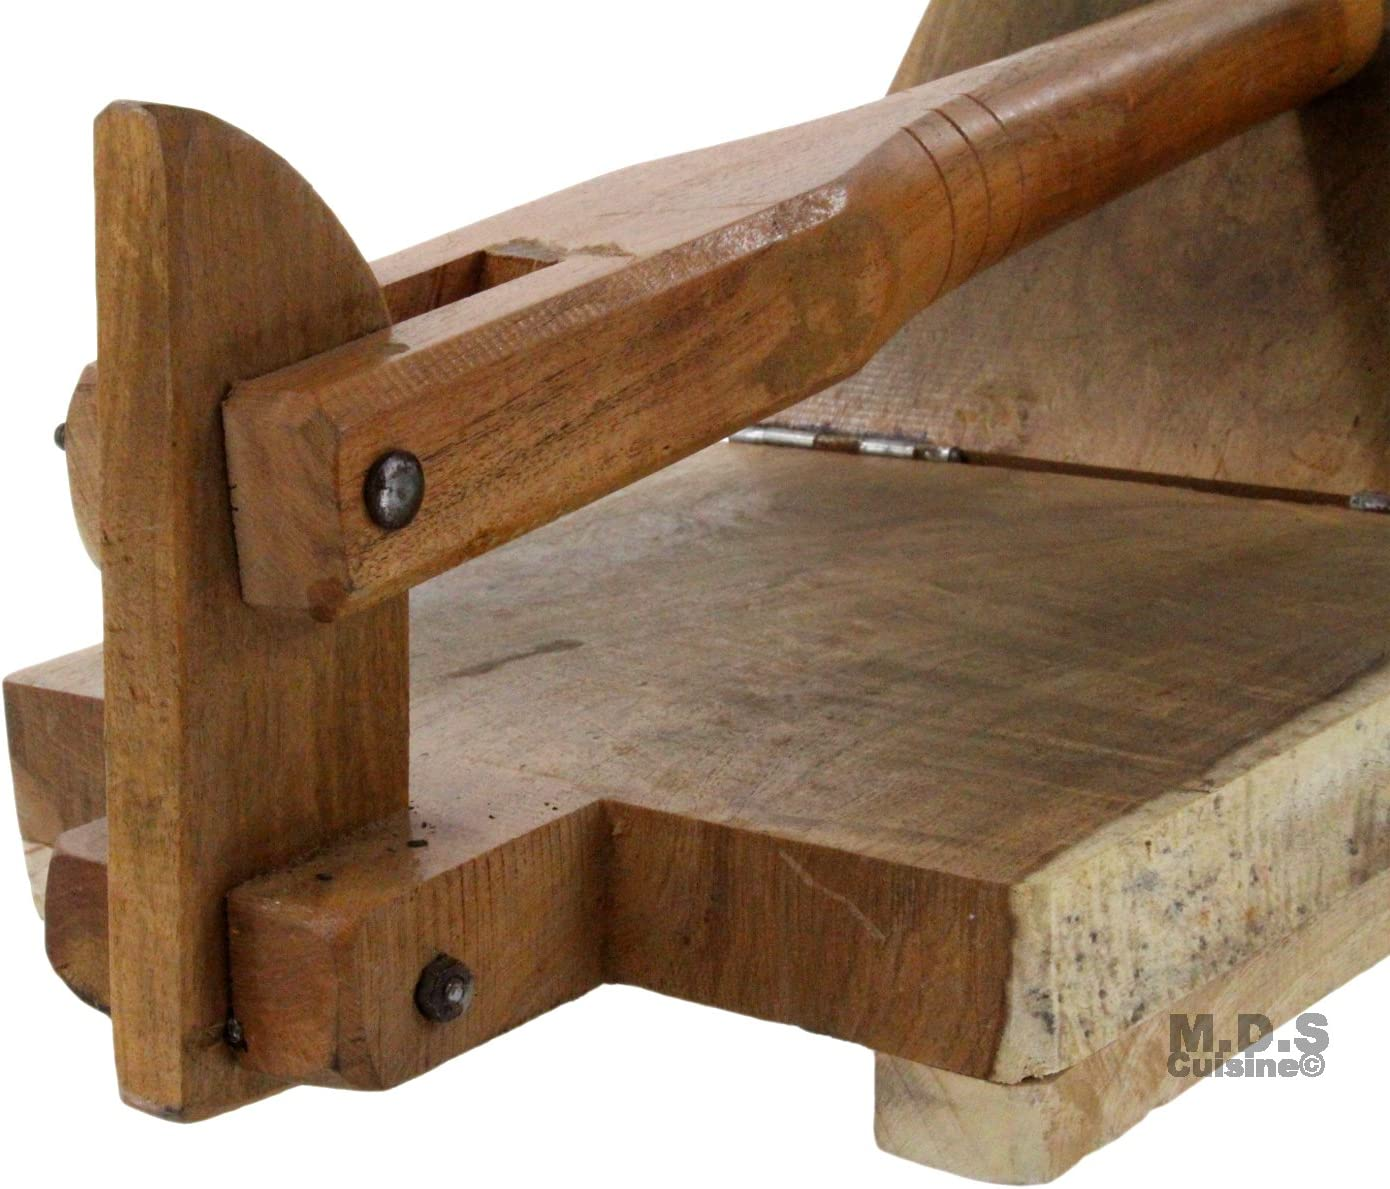 Hemoton Wooden Tortilla Press Traditional Wood Tortilla Maker ...